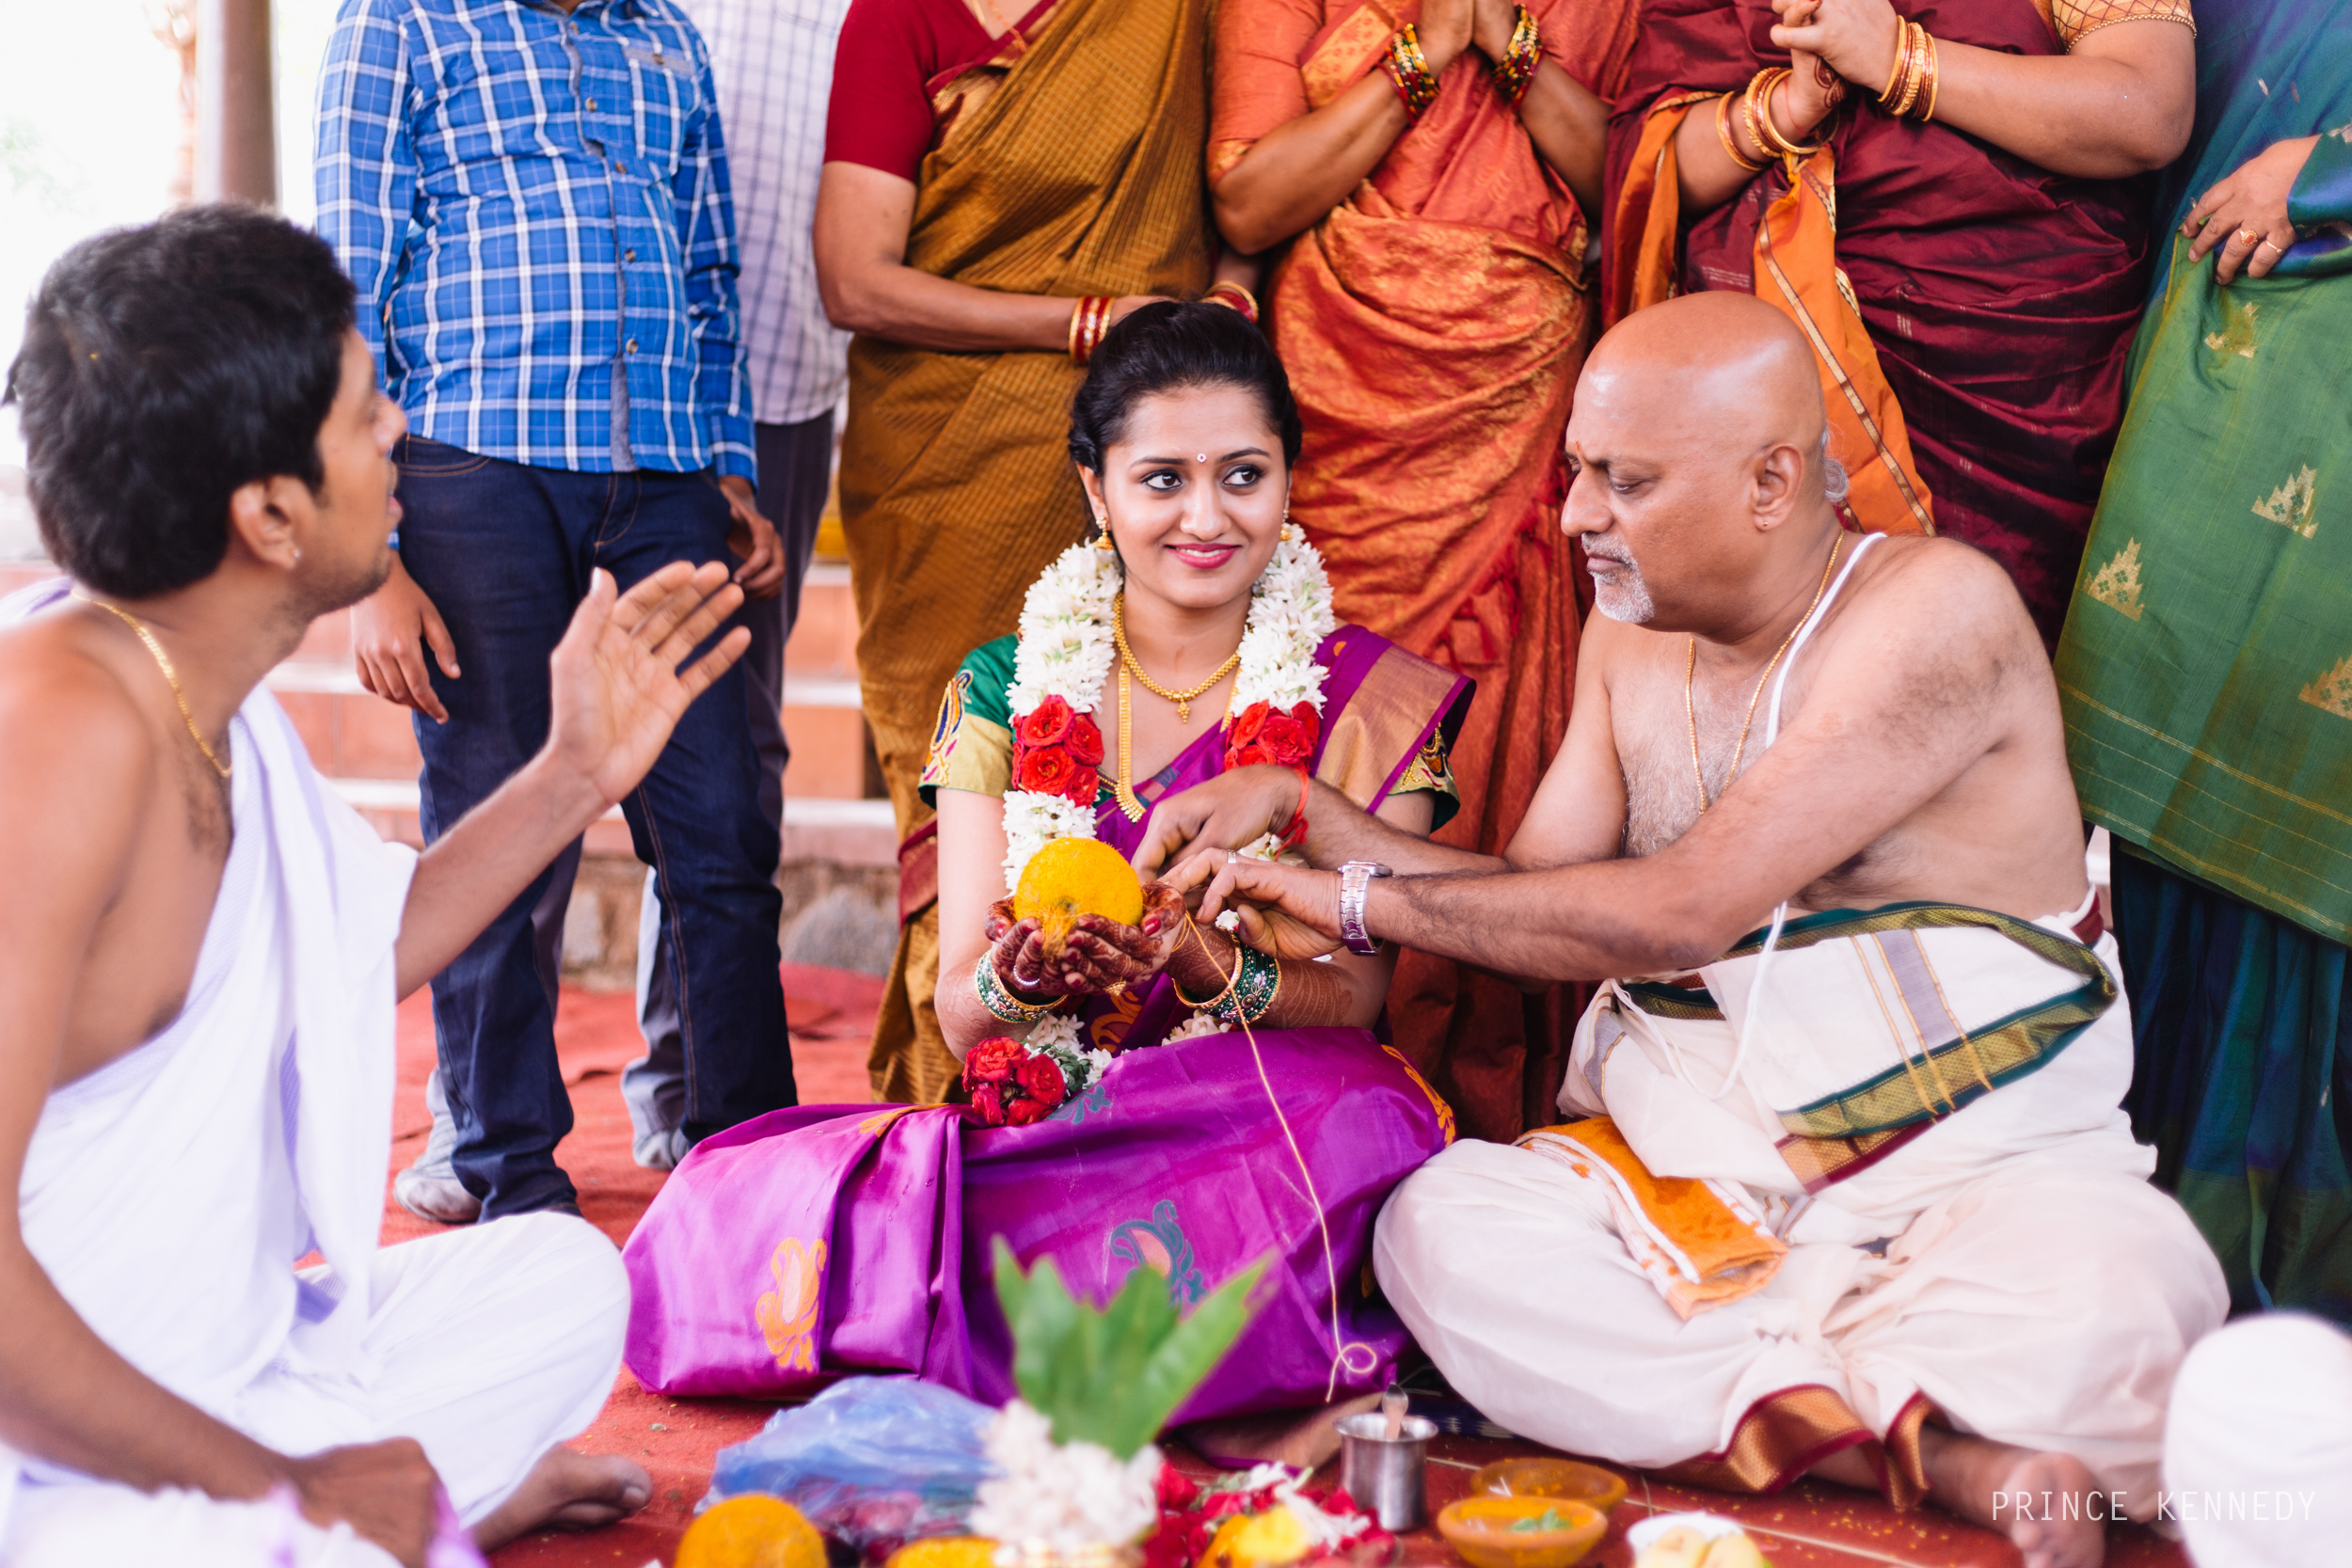 Athmajja-Nithesh-Engagement-Couple-Portrait-Portraiture-Wedding-Couple-Portrait-Chennai-Photographer-Candid-Photography-Destination-Best-Prince-Kennedy-Photography-120.jpg